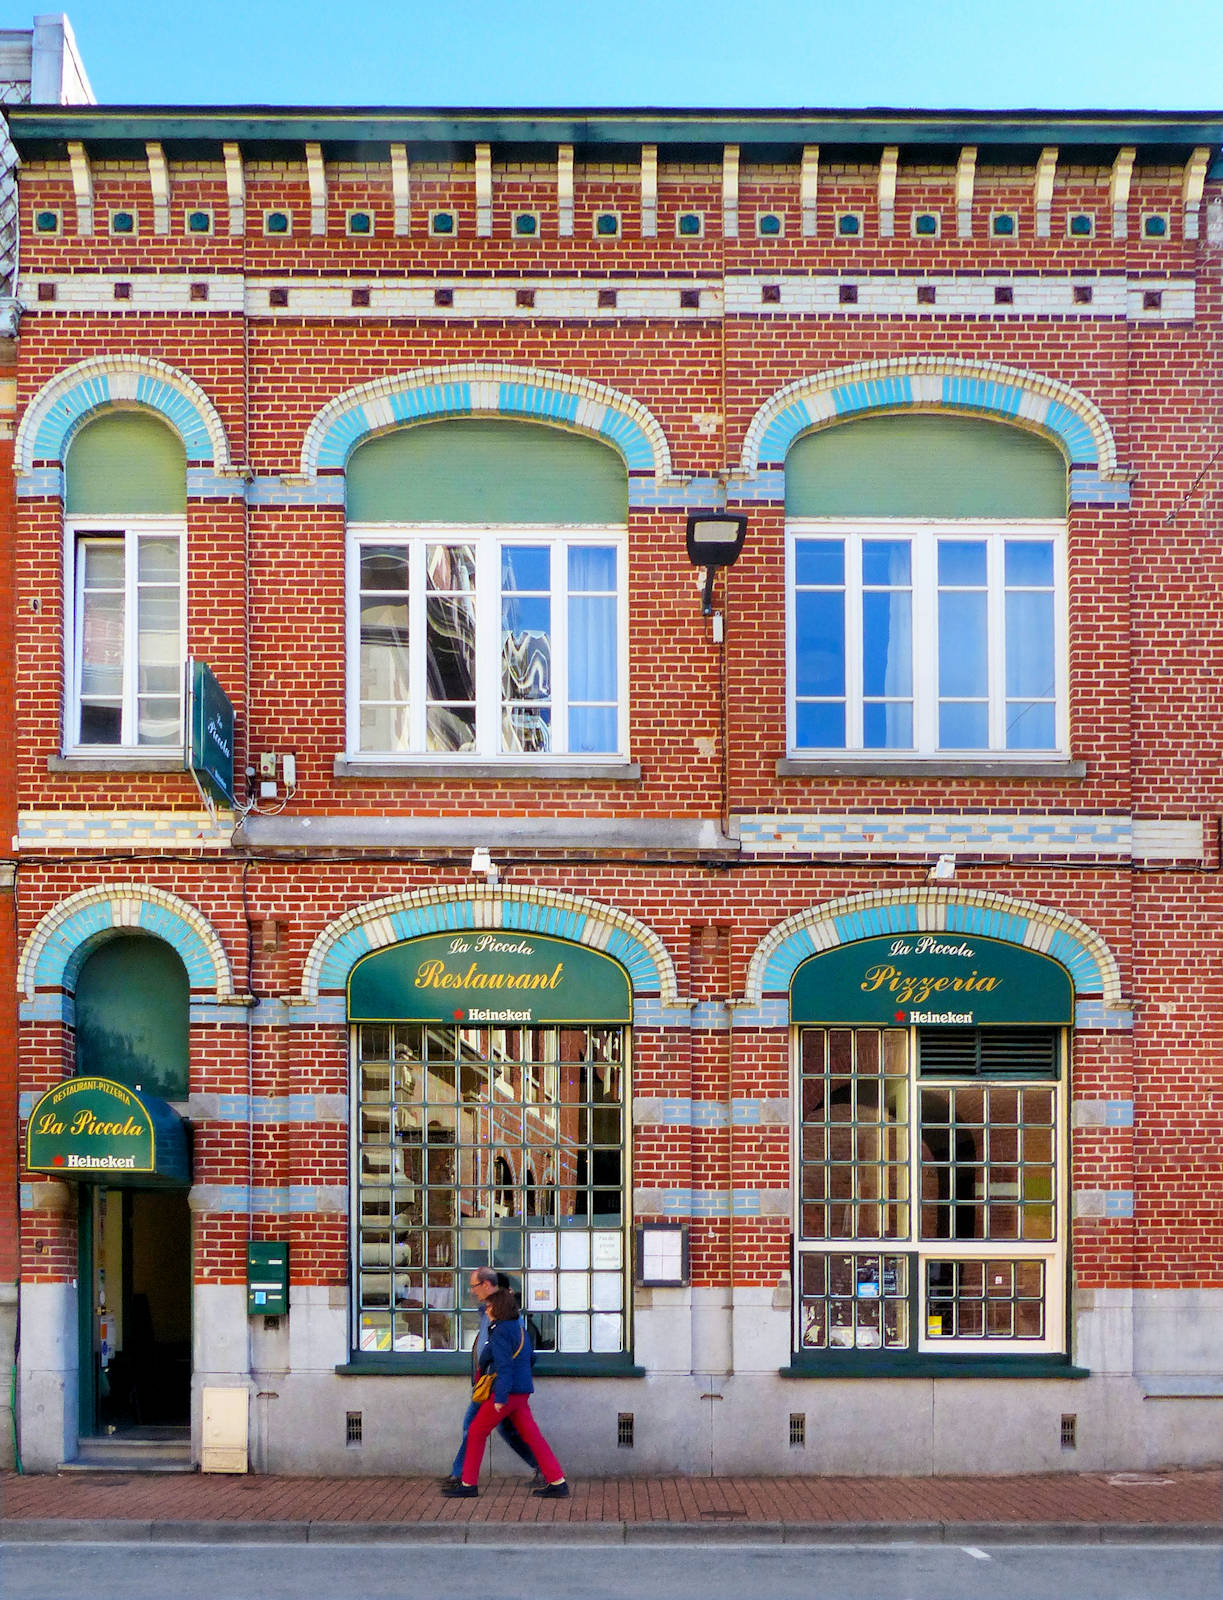 Piccola Restaurant Pizzeria - Tourcoing, rue des Anges